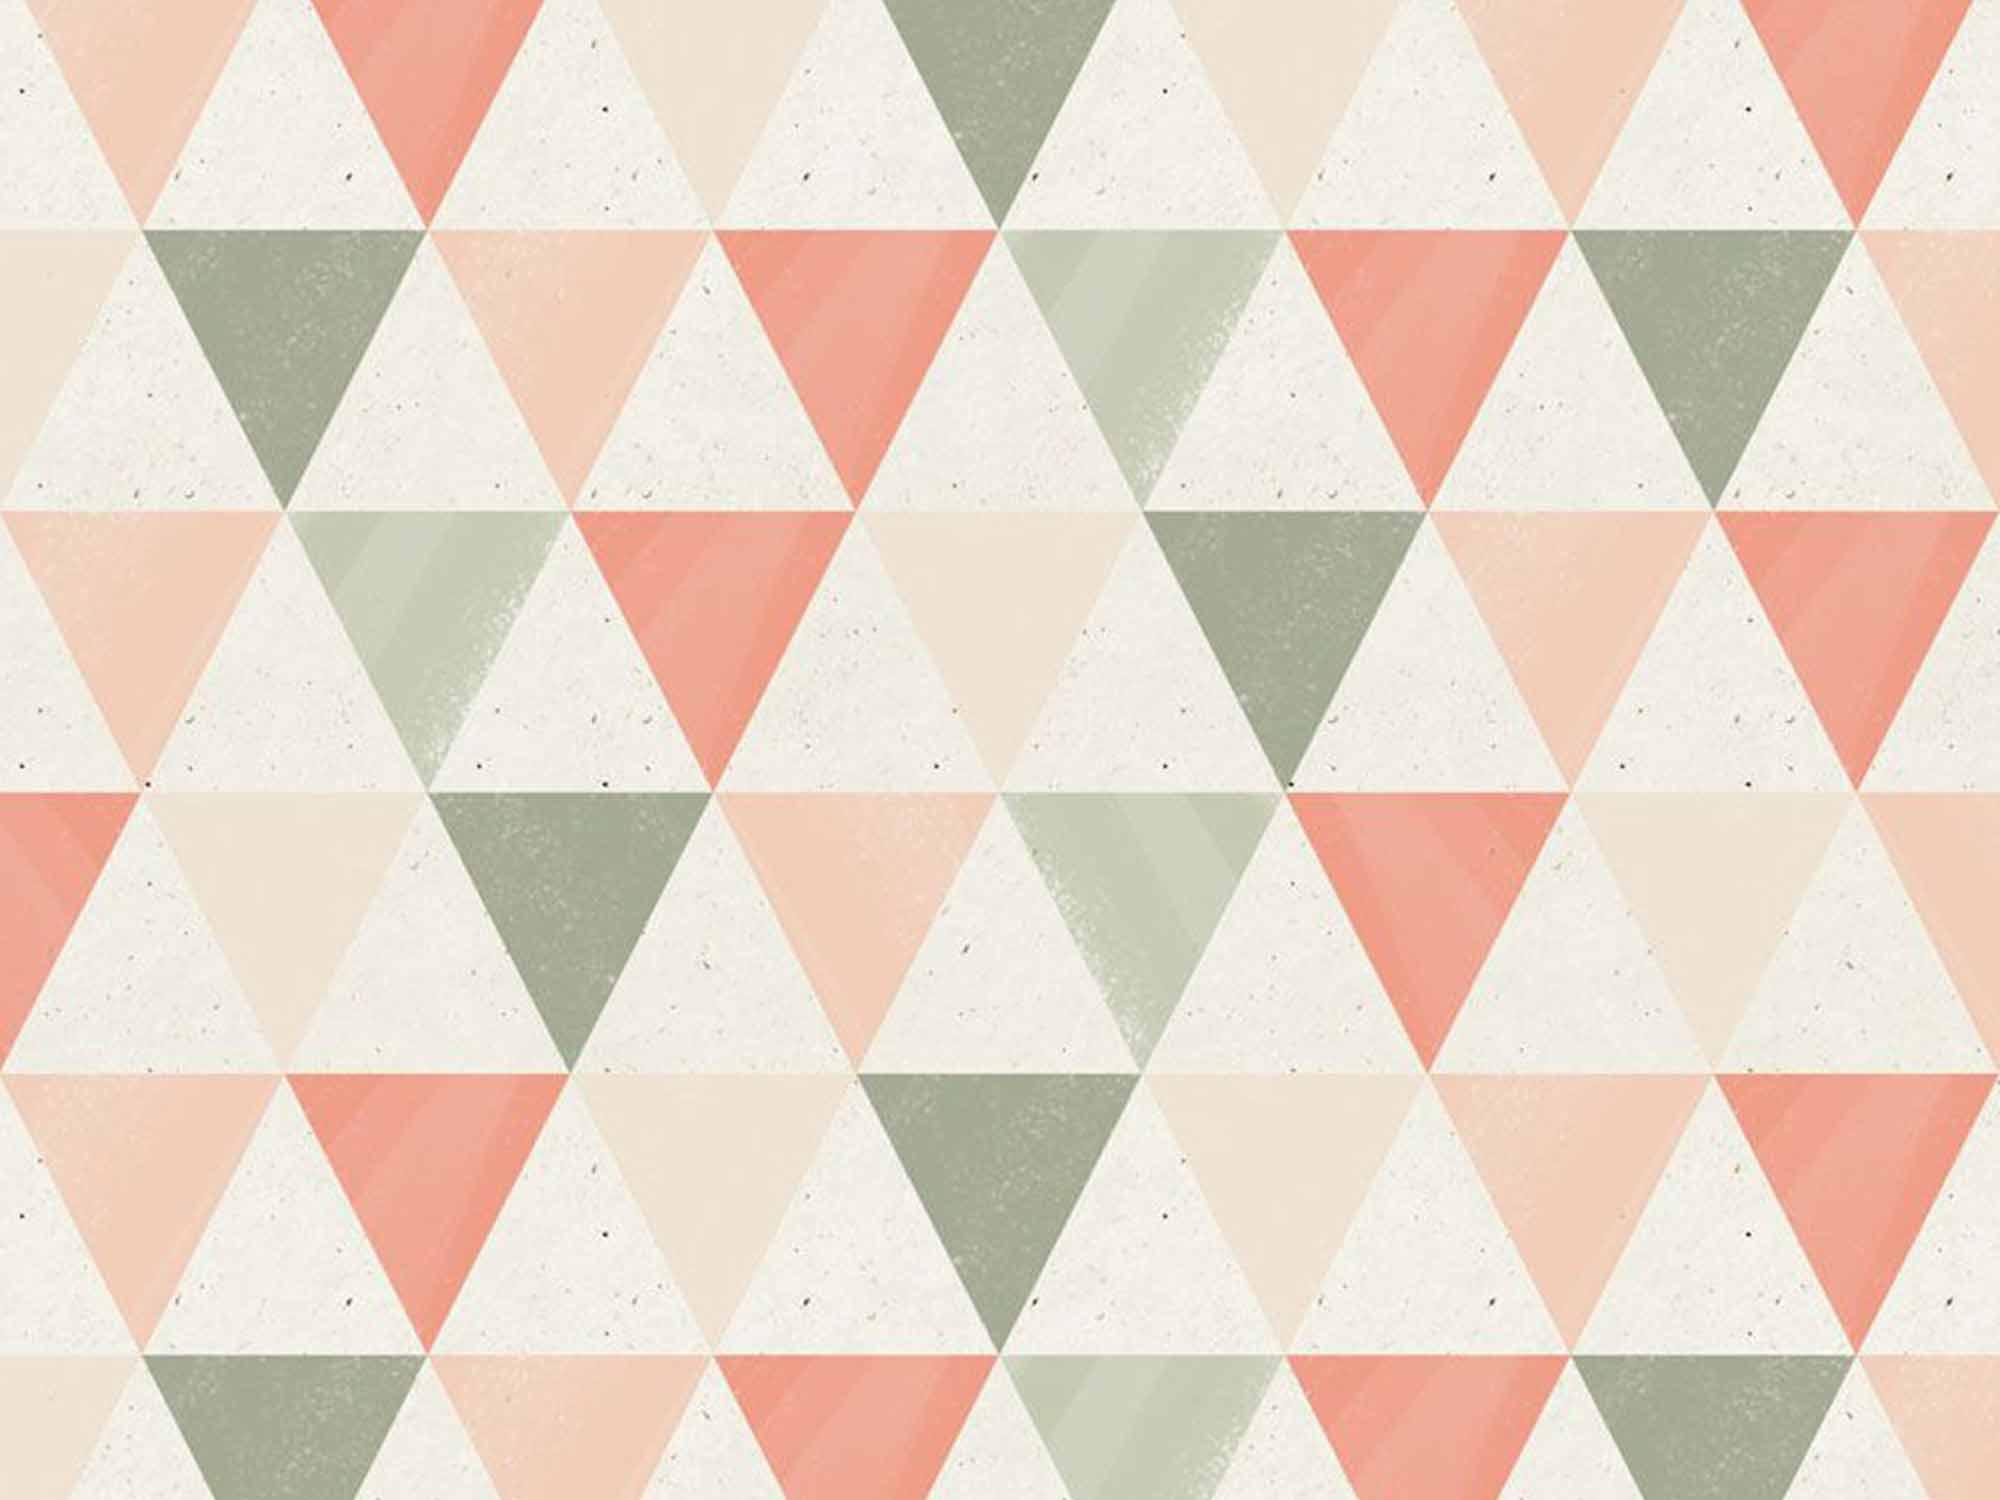 Papel de Parede para Sala Geométrico 0074 - Adesivos de Parede  - Paredes Decoradas